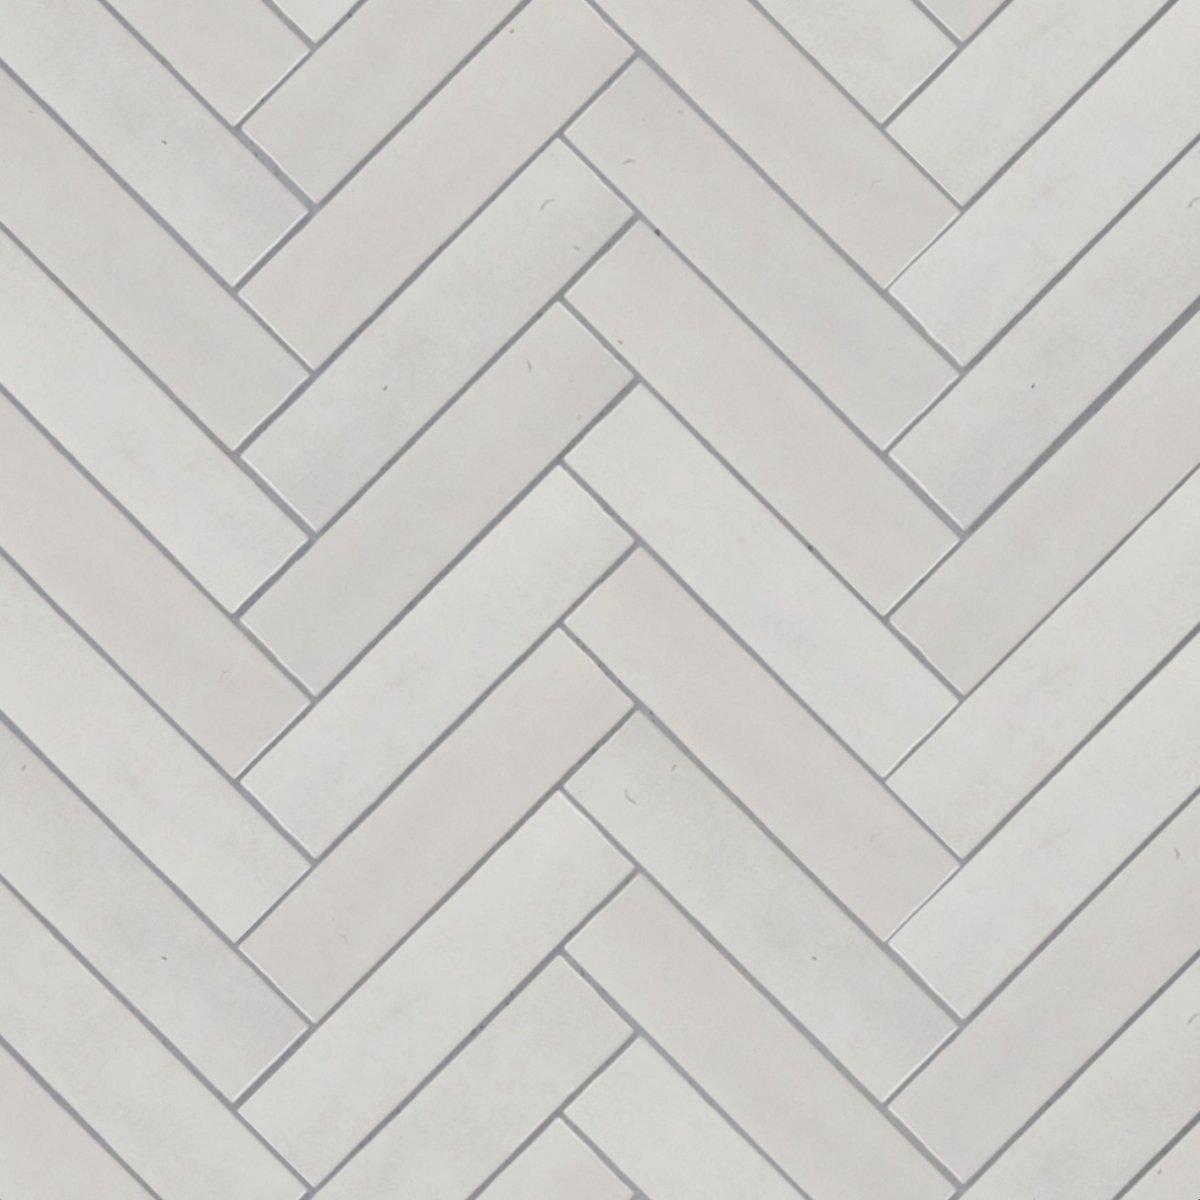 MV Casablanca Mattoni Blanco 58x240mm_Stiles_Product_Image